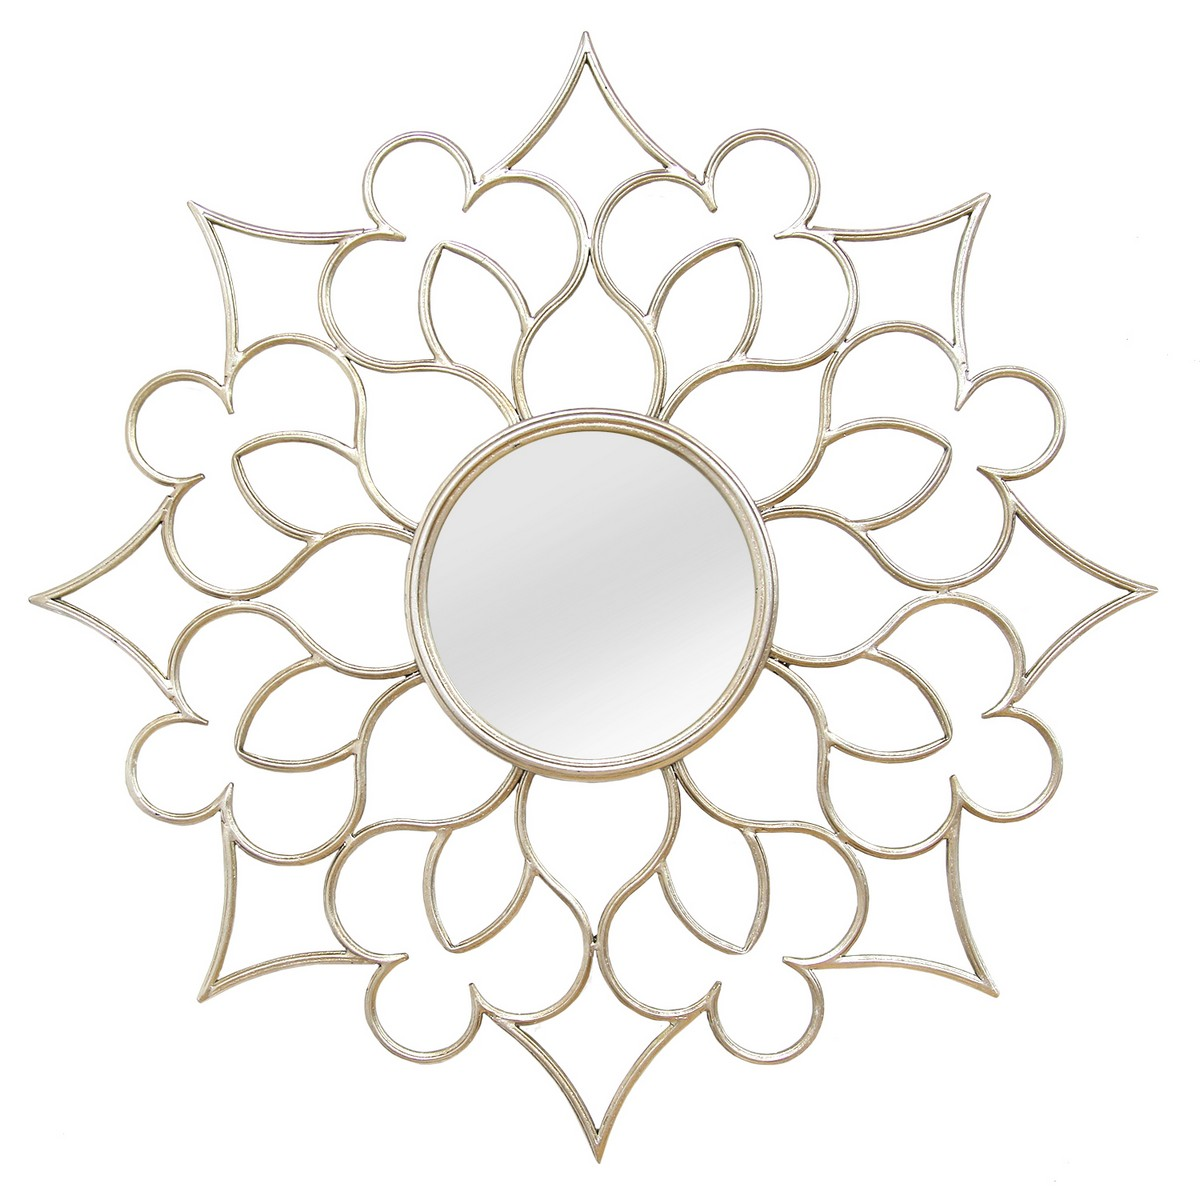 Stratton Home Decor Francesca Wall Mirror - Silver